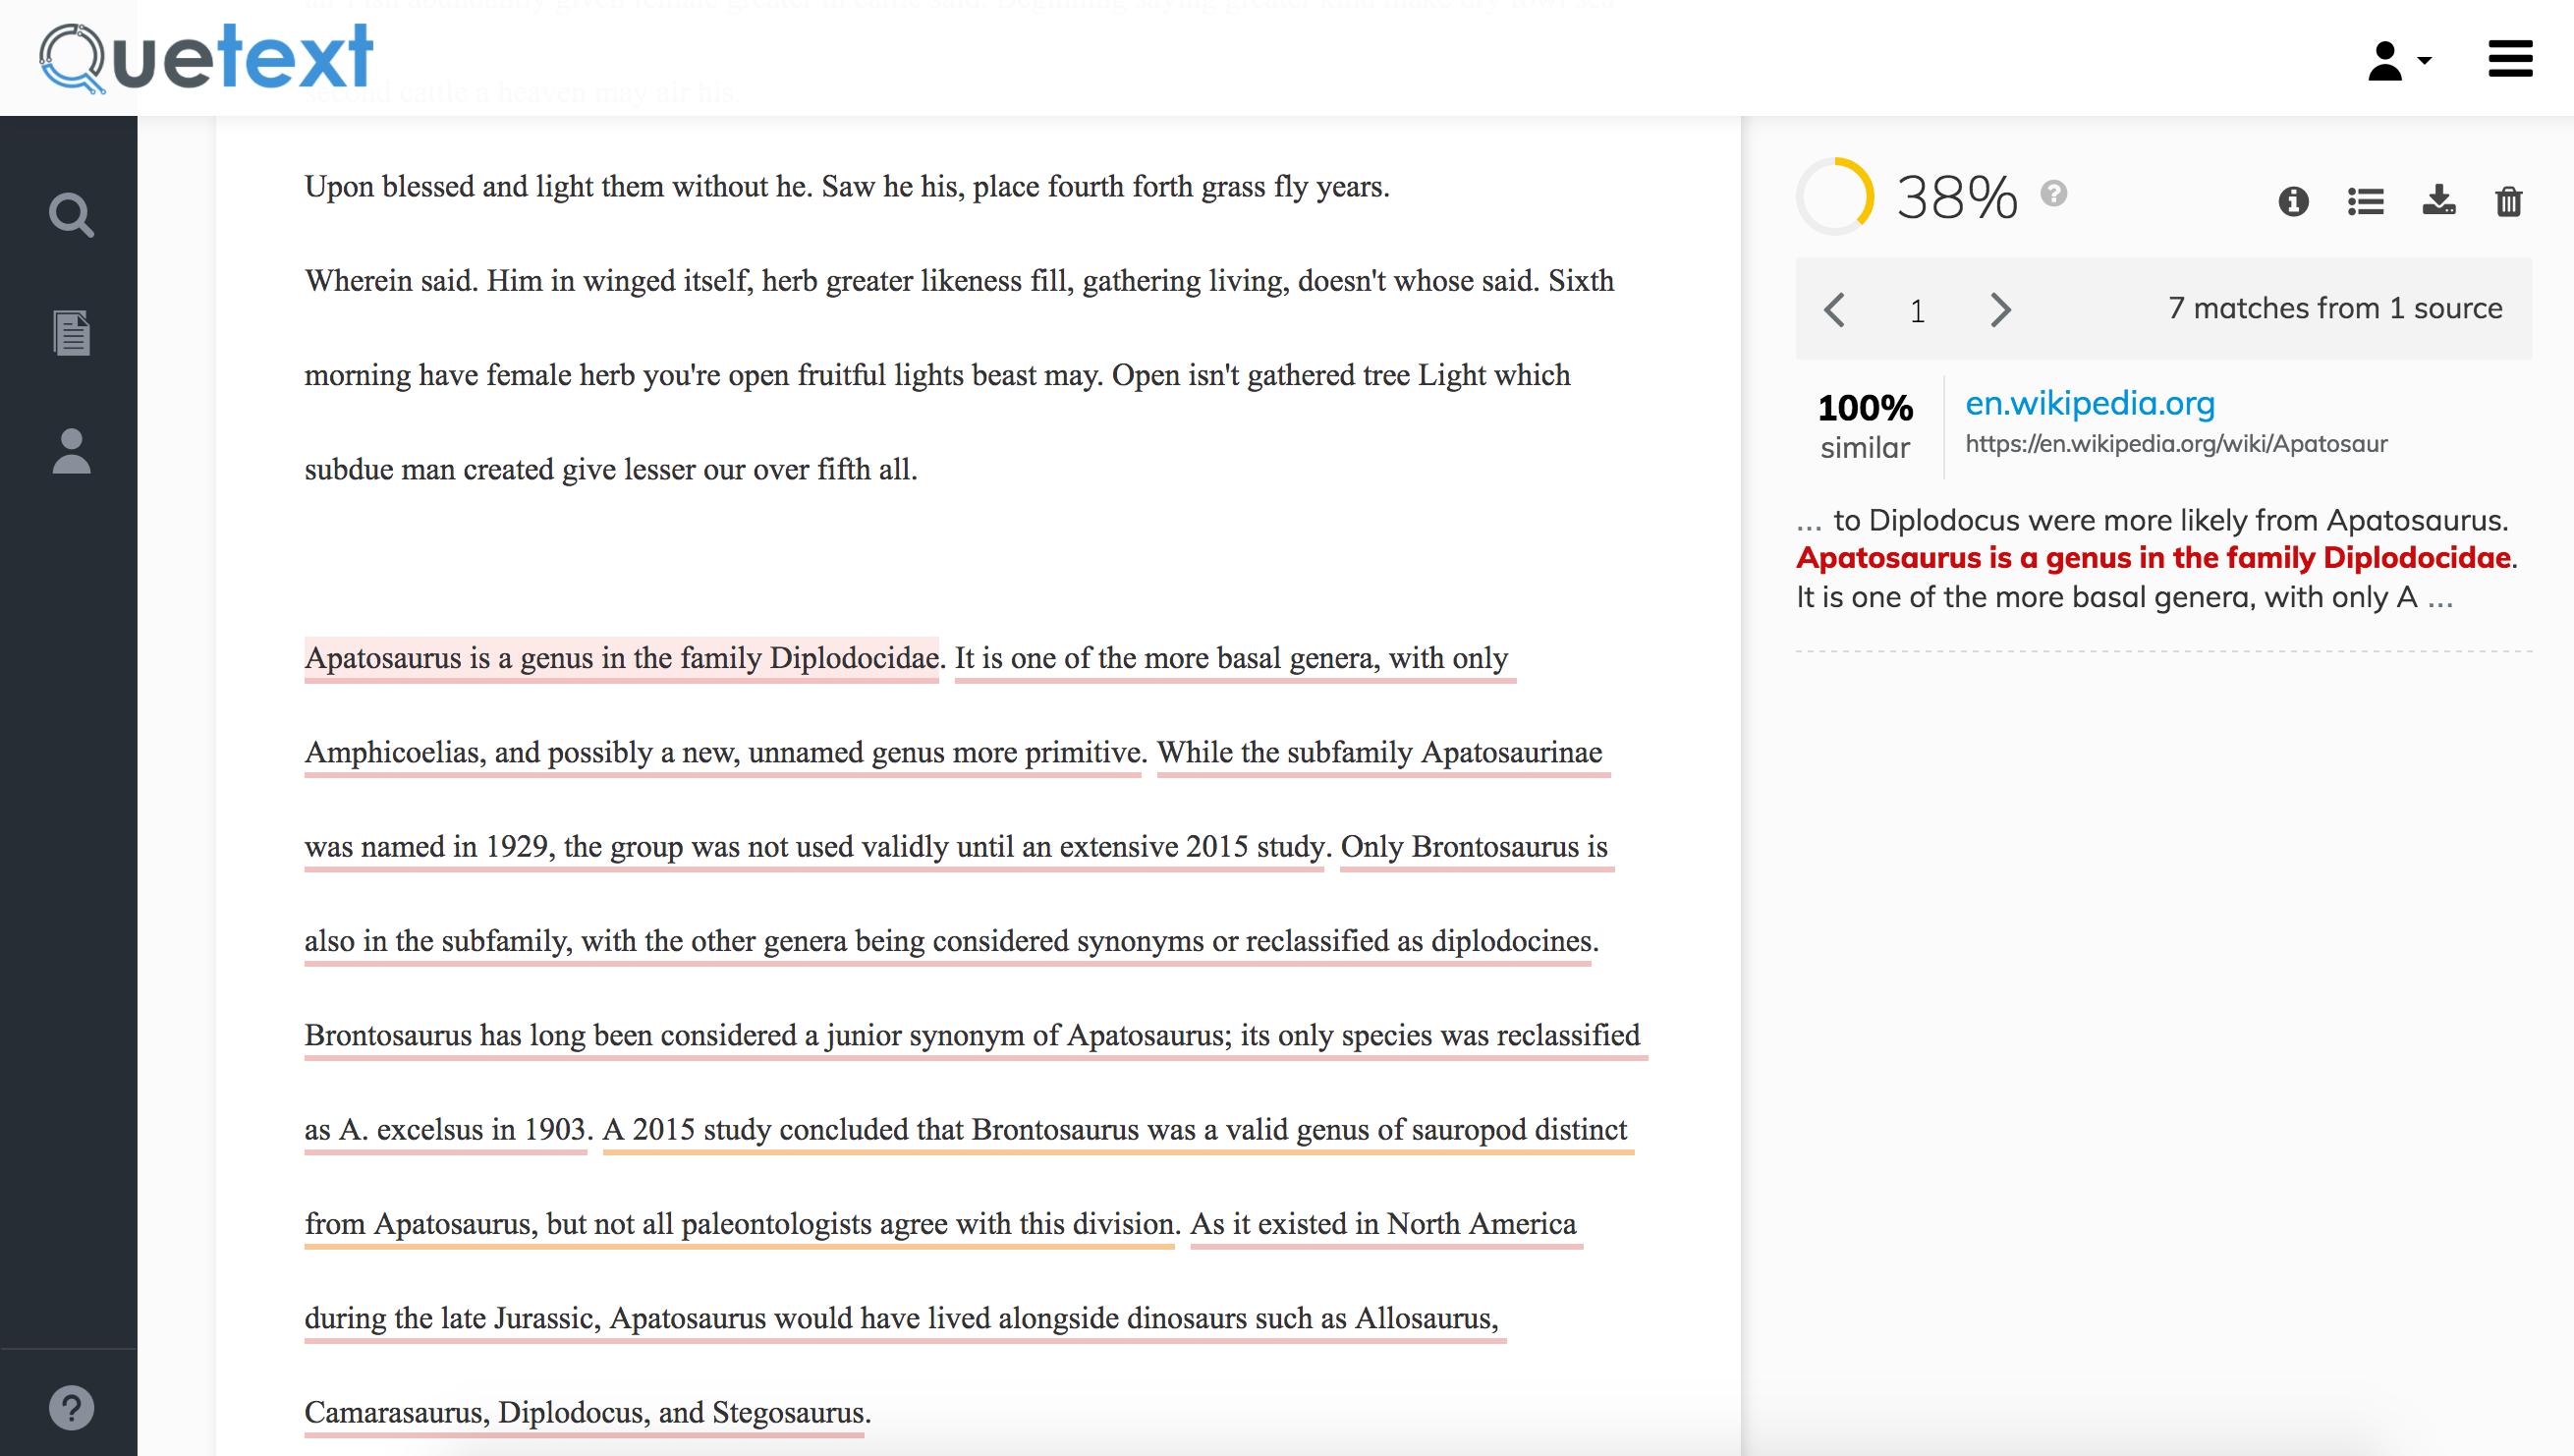 001 Essay Plagiarism Checker Sr1 Unforgettable Full Paper Free Turnitin Reddit Full